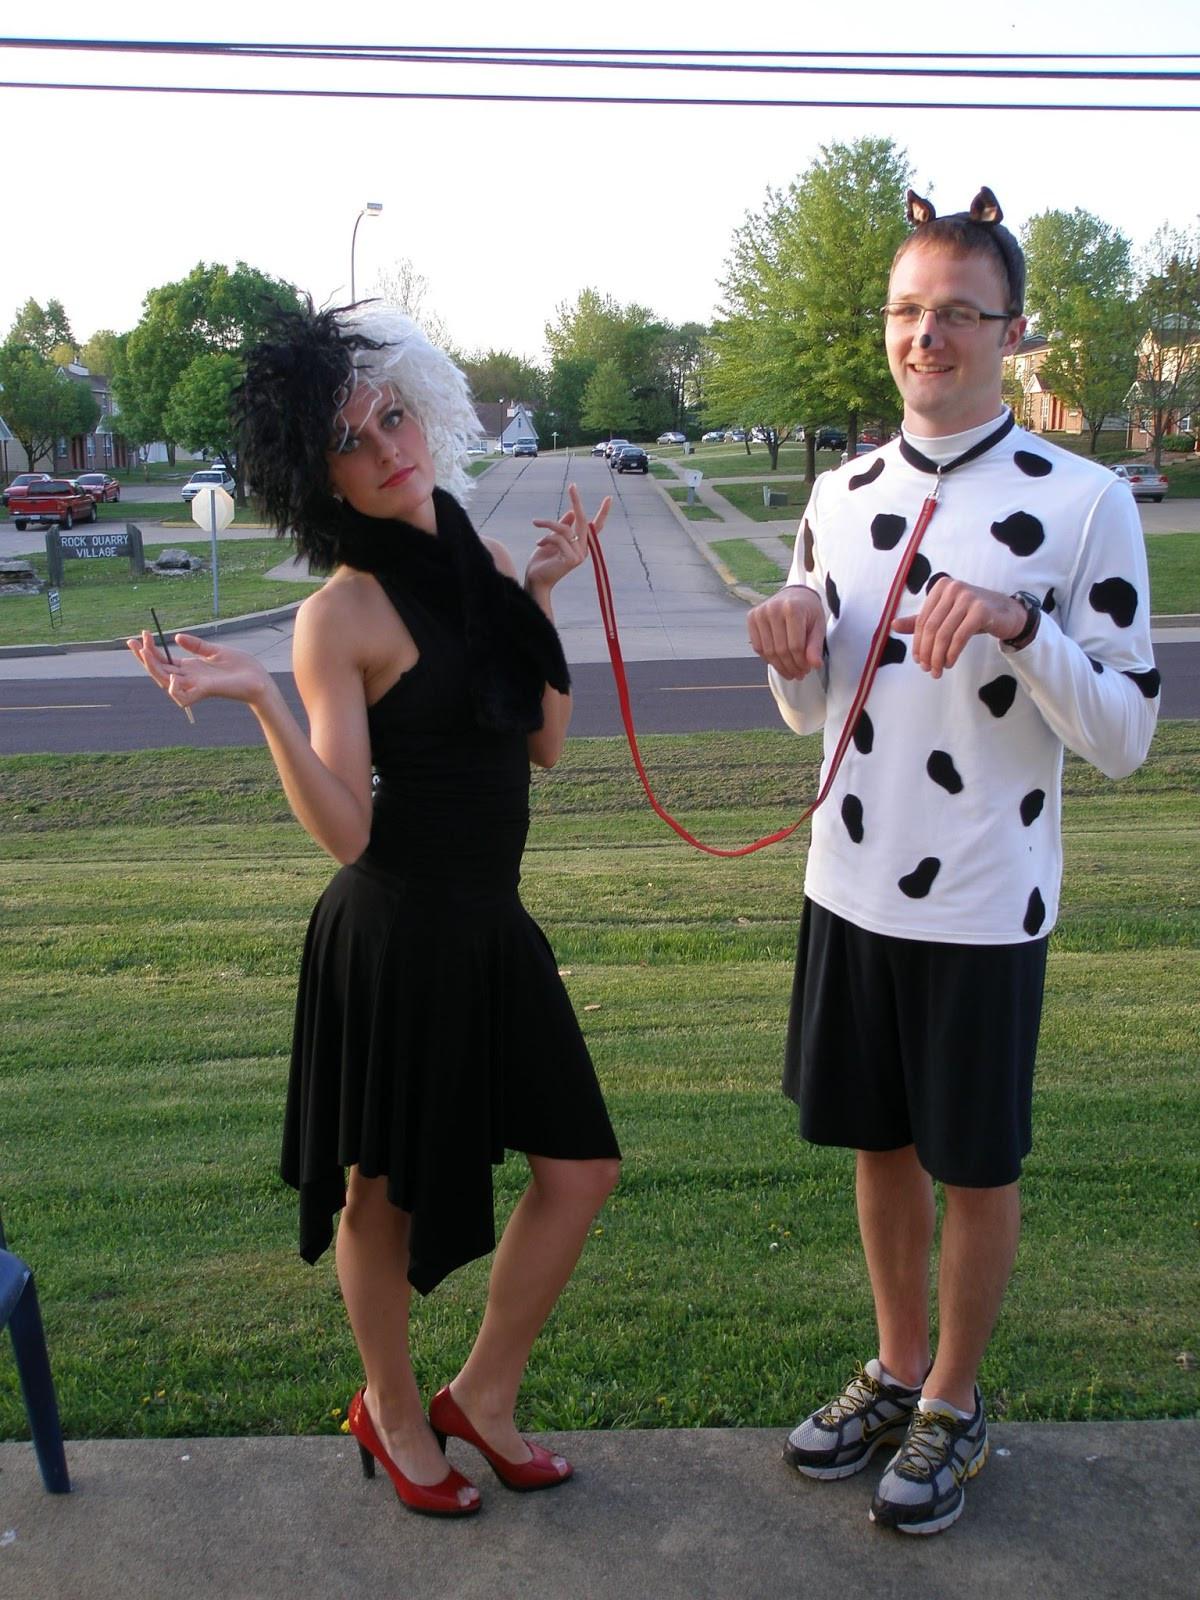 Couples Costumes DIY  Katie in Kansas DIY Couples Halloween Costume Ideas